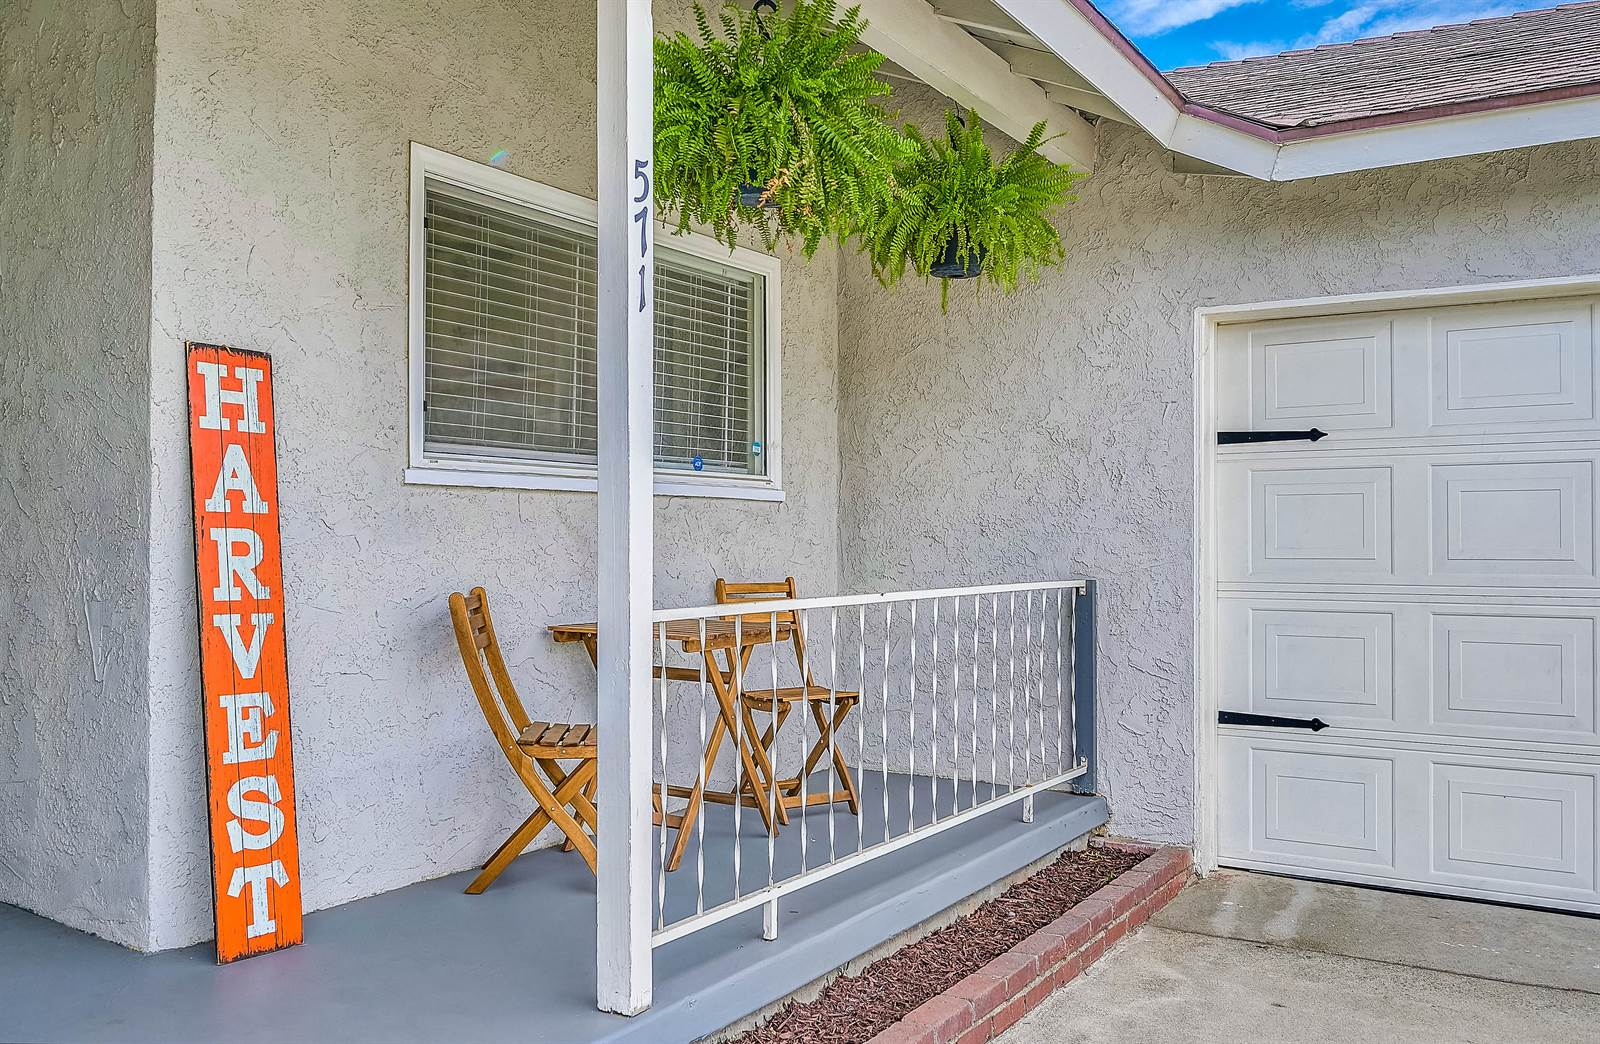 571 East Merrill Avenue, Rialto, CA 92376